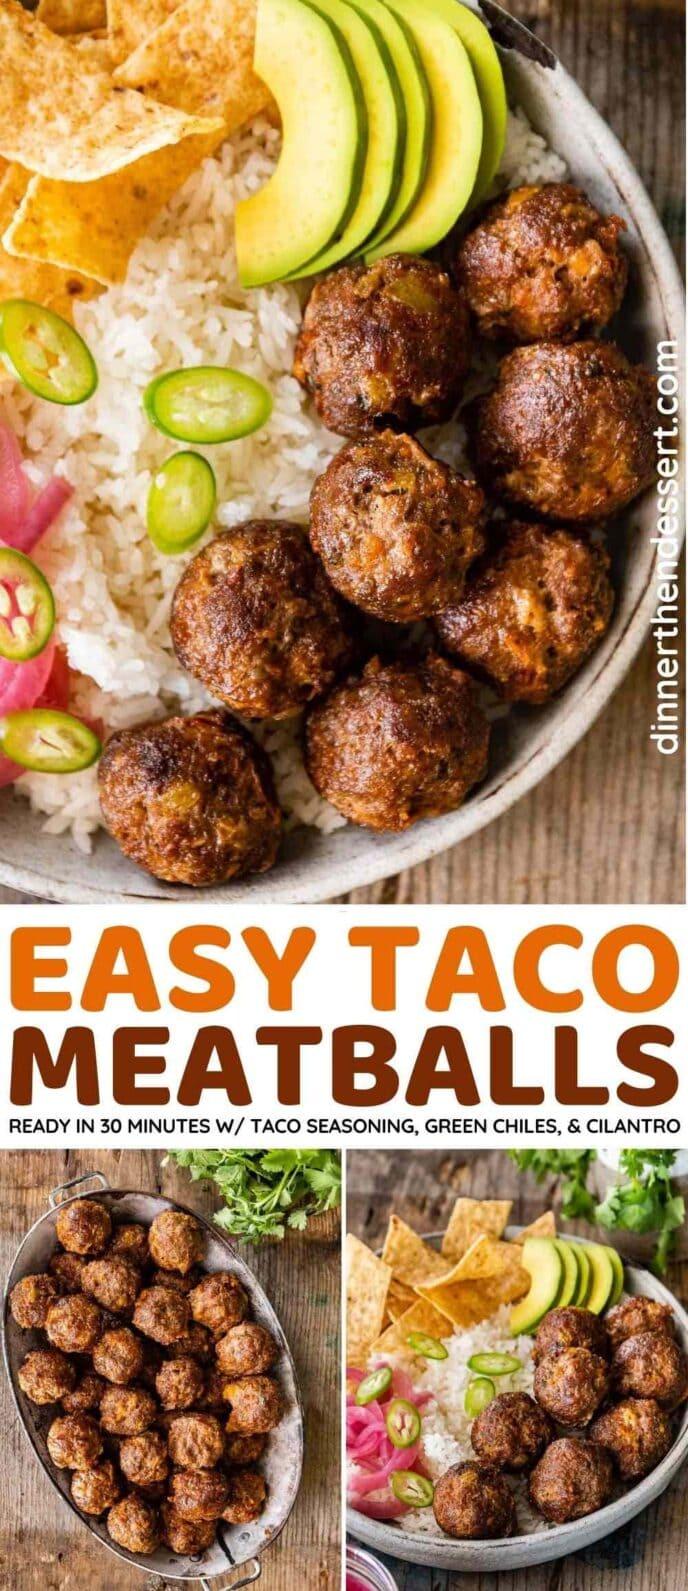 Taco Meatballs collage